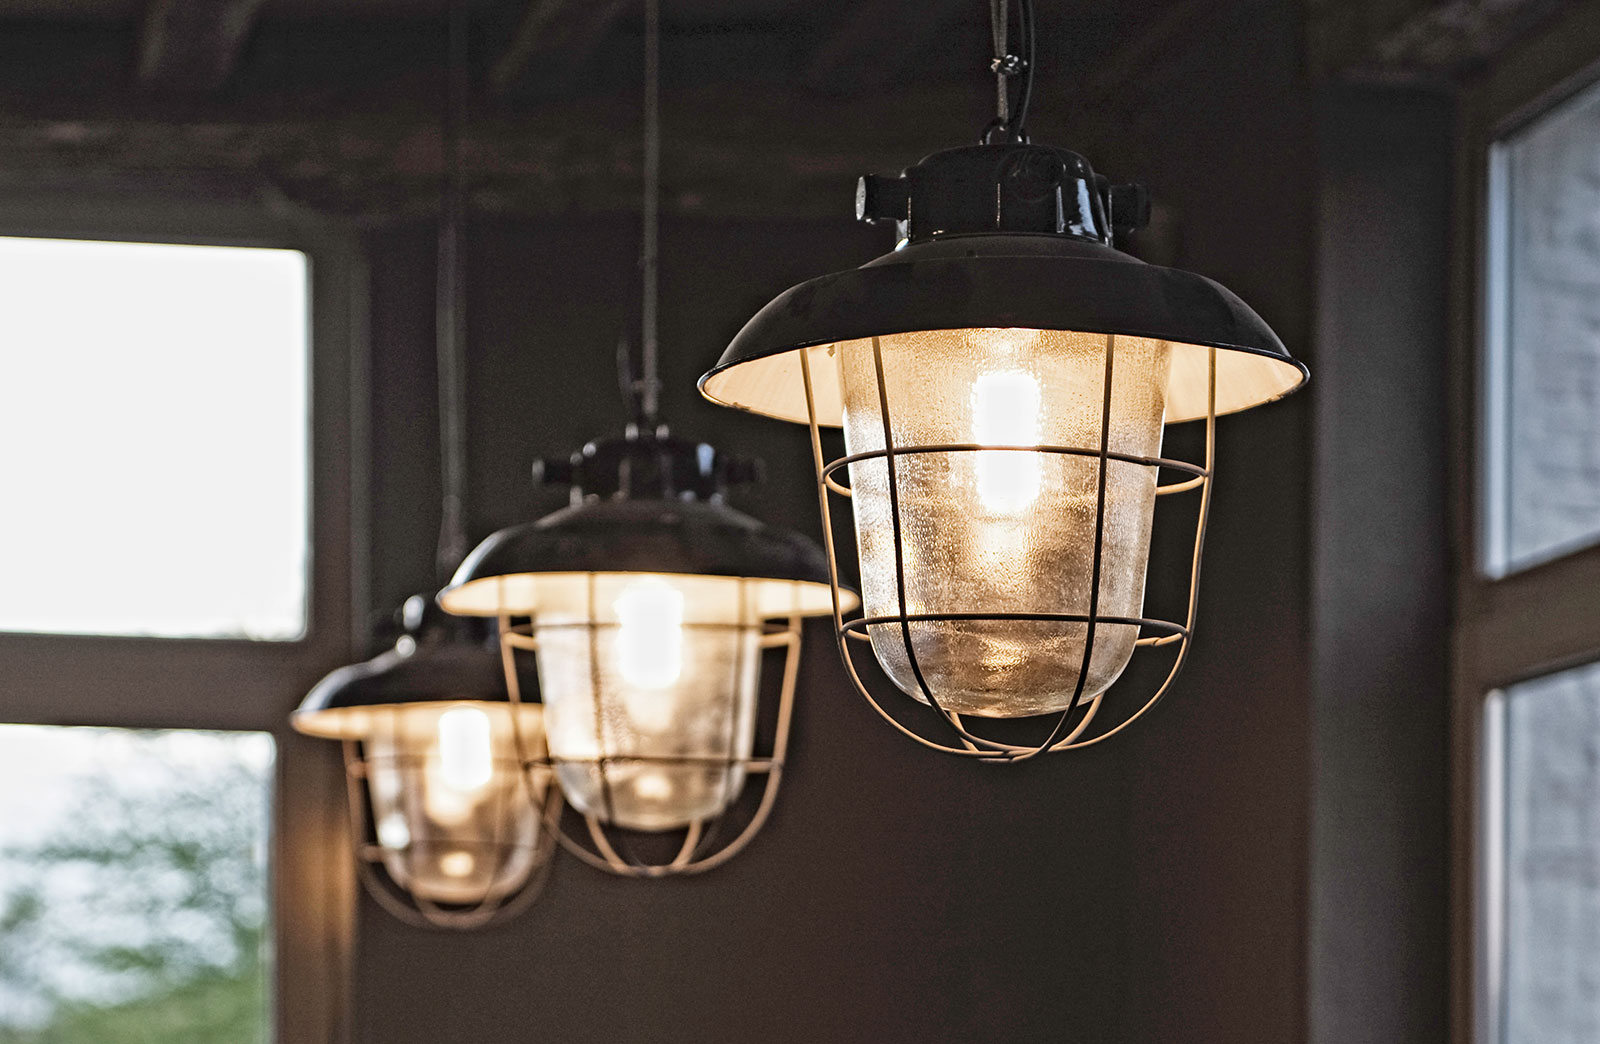 Unieke stukken woontheater for Industriele lamp keuken